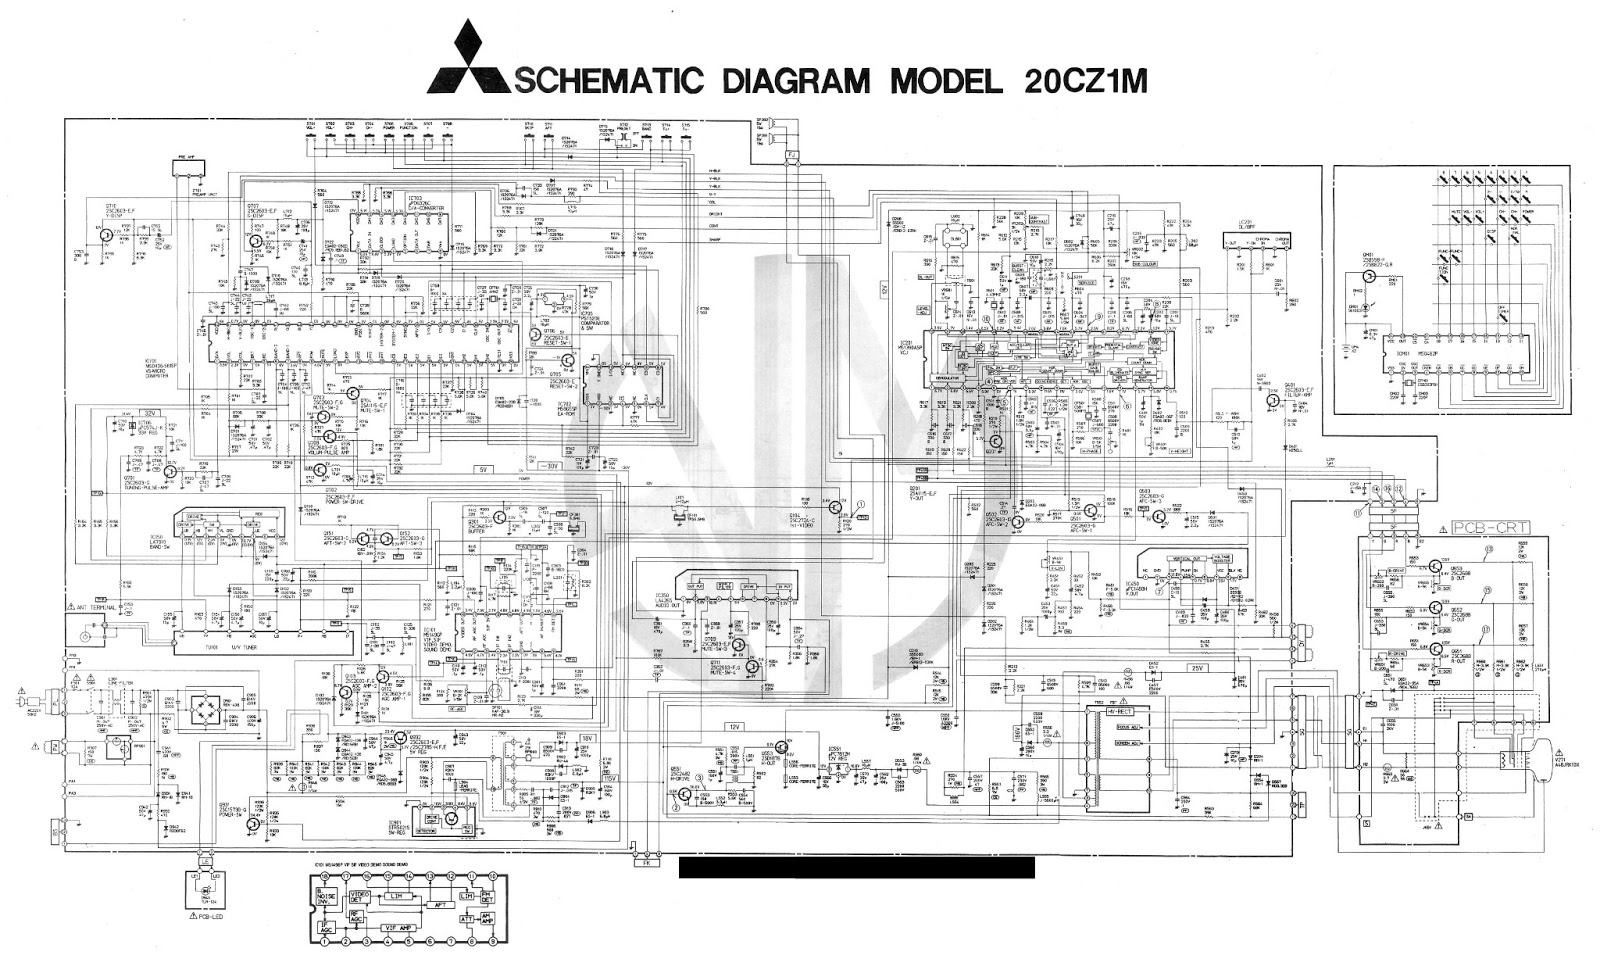 Electro Help  Mitsubishi - 2-cz1 Crt Tv